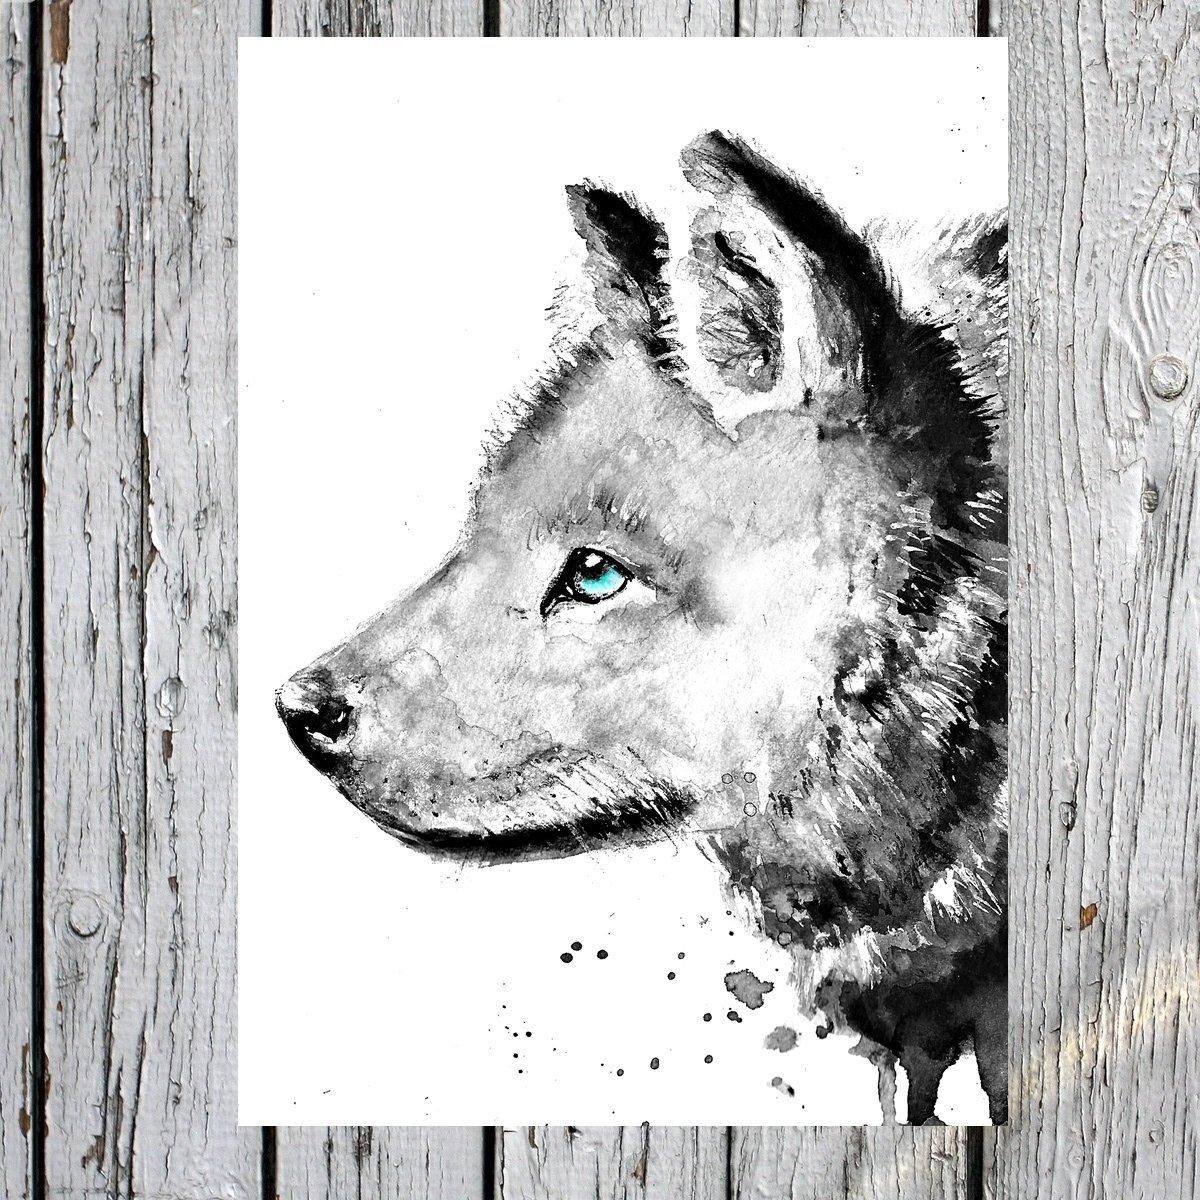 Tiny Tami ★ 'Blue eyed' Postkarte ★ Wolf ★ Liebe ★ Geburt ★ Gruß karte ★Wild ★100 % Handmade